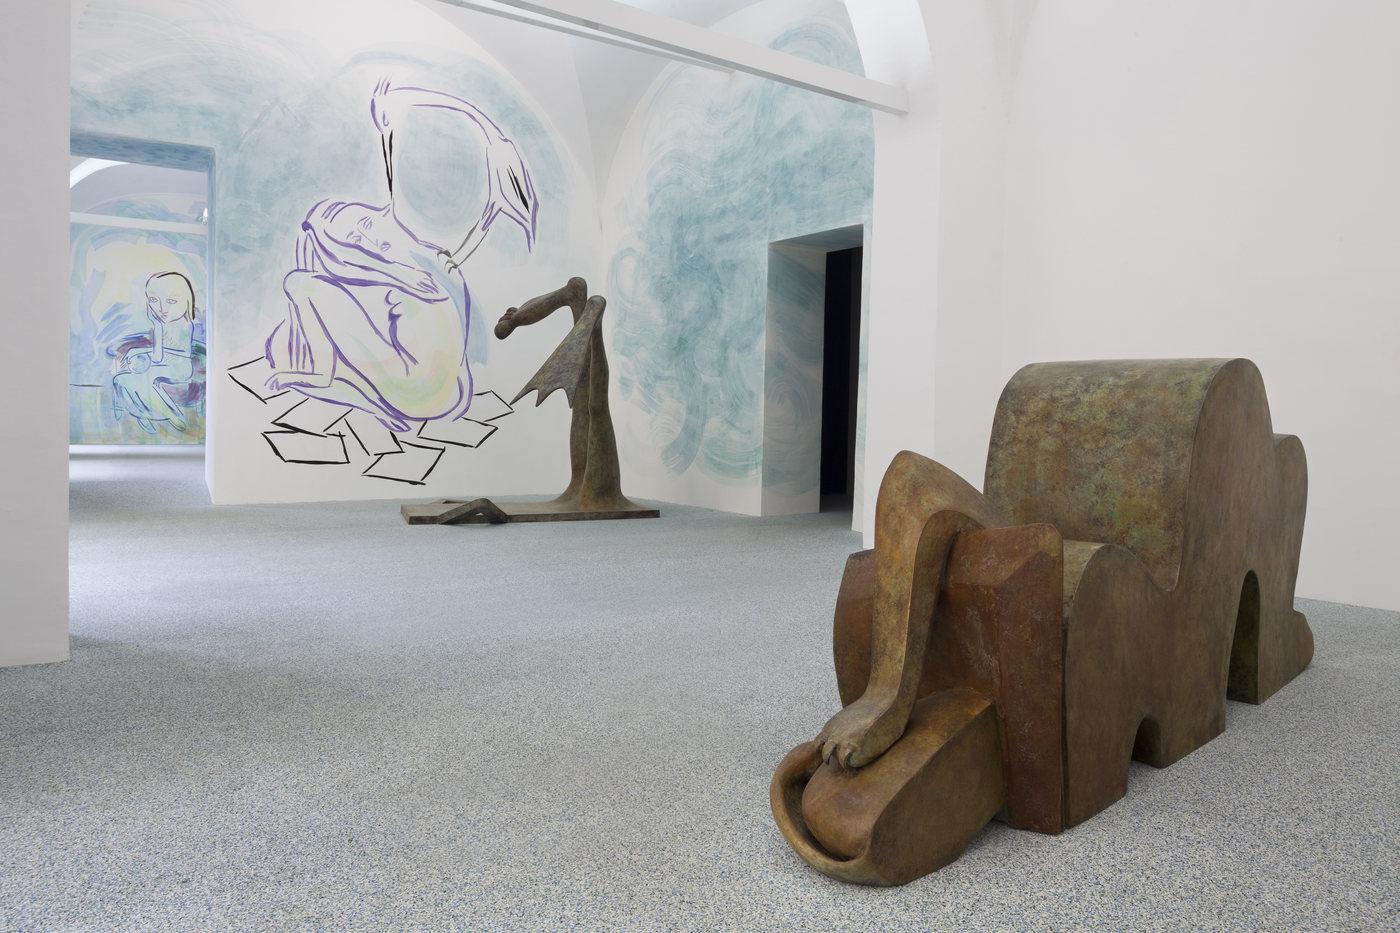 14. Camille Henrot, Monday. Installation view, Fondazione Memmo, 2016